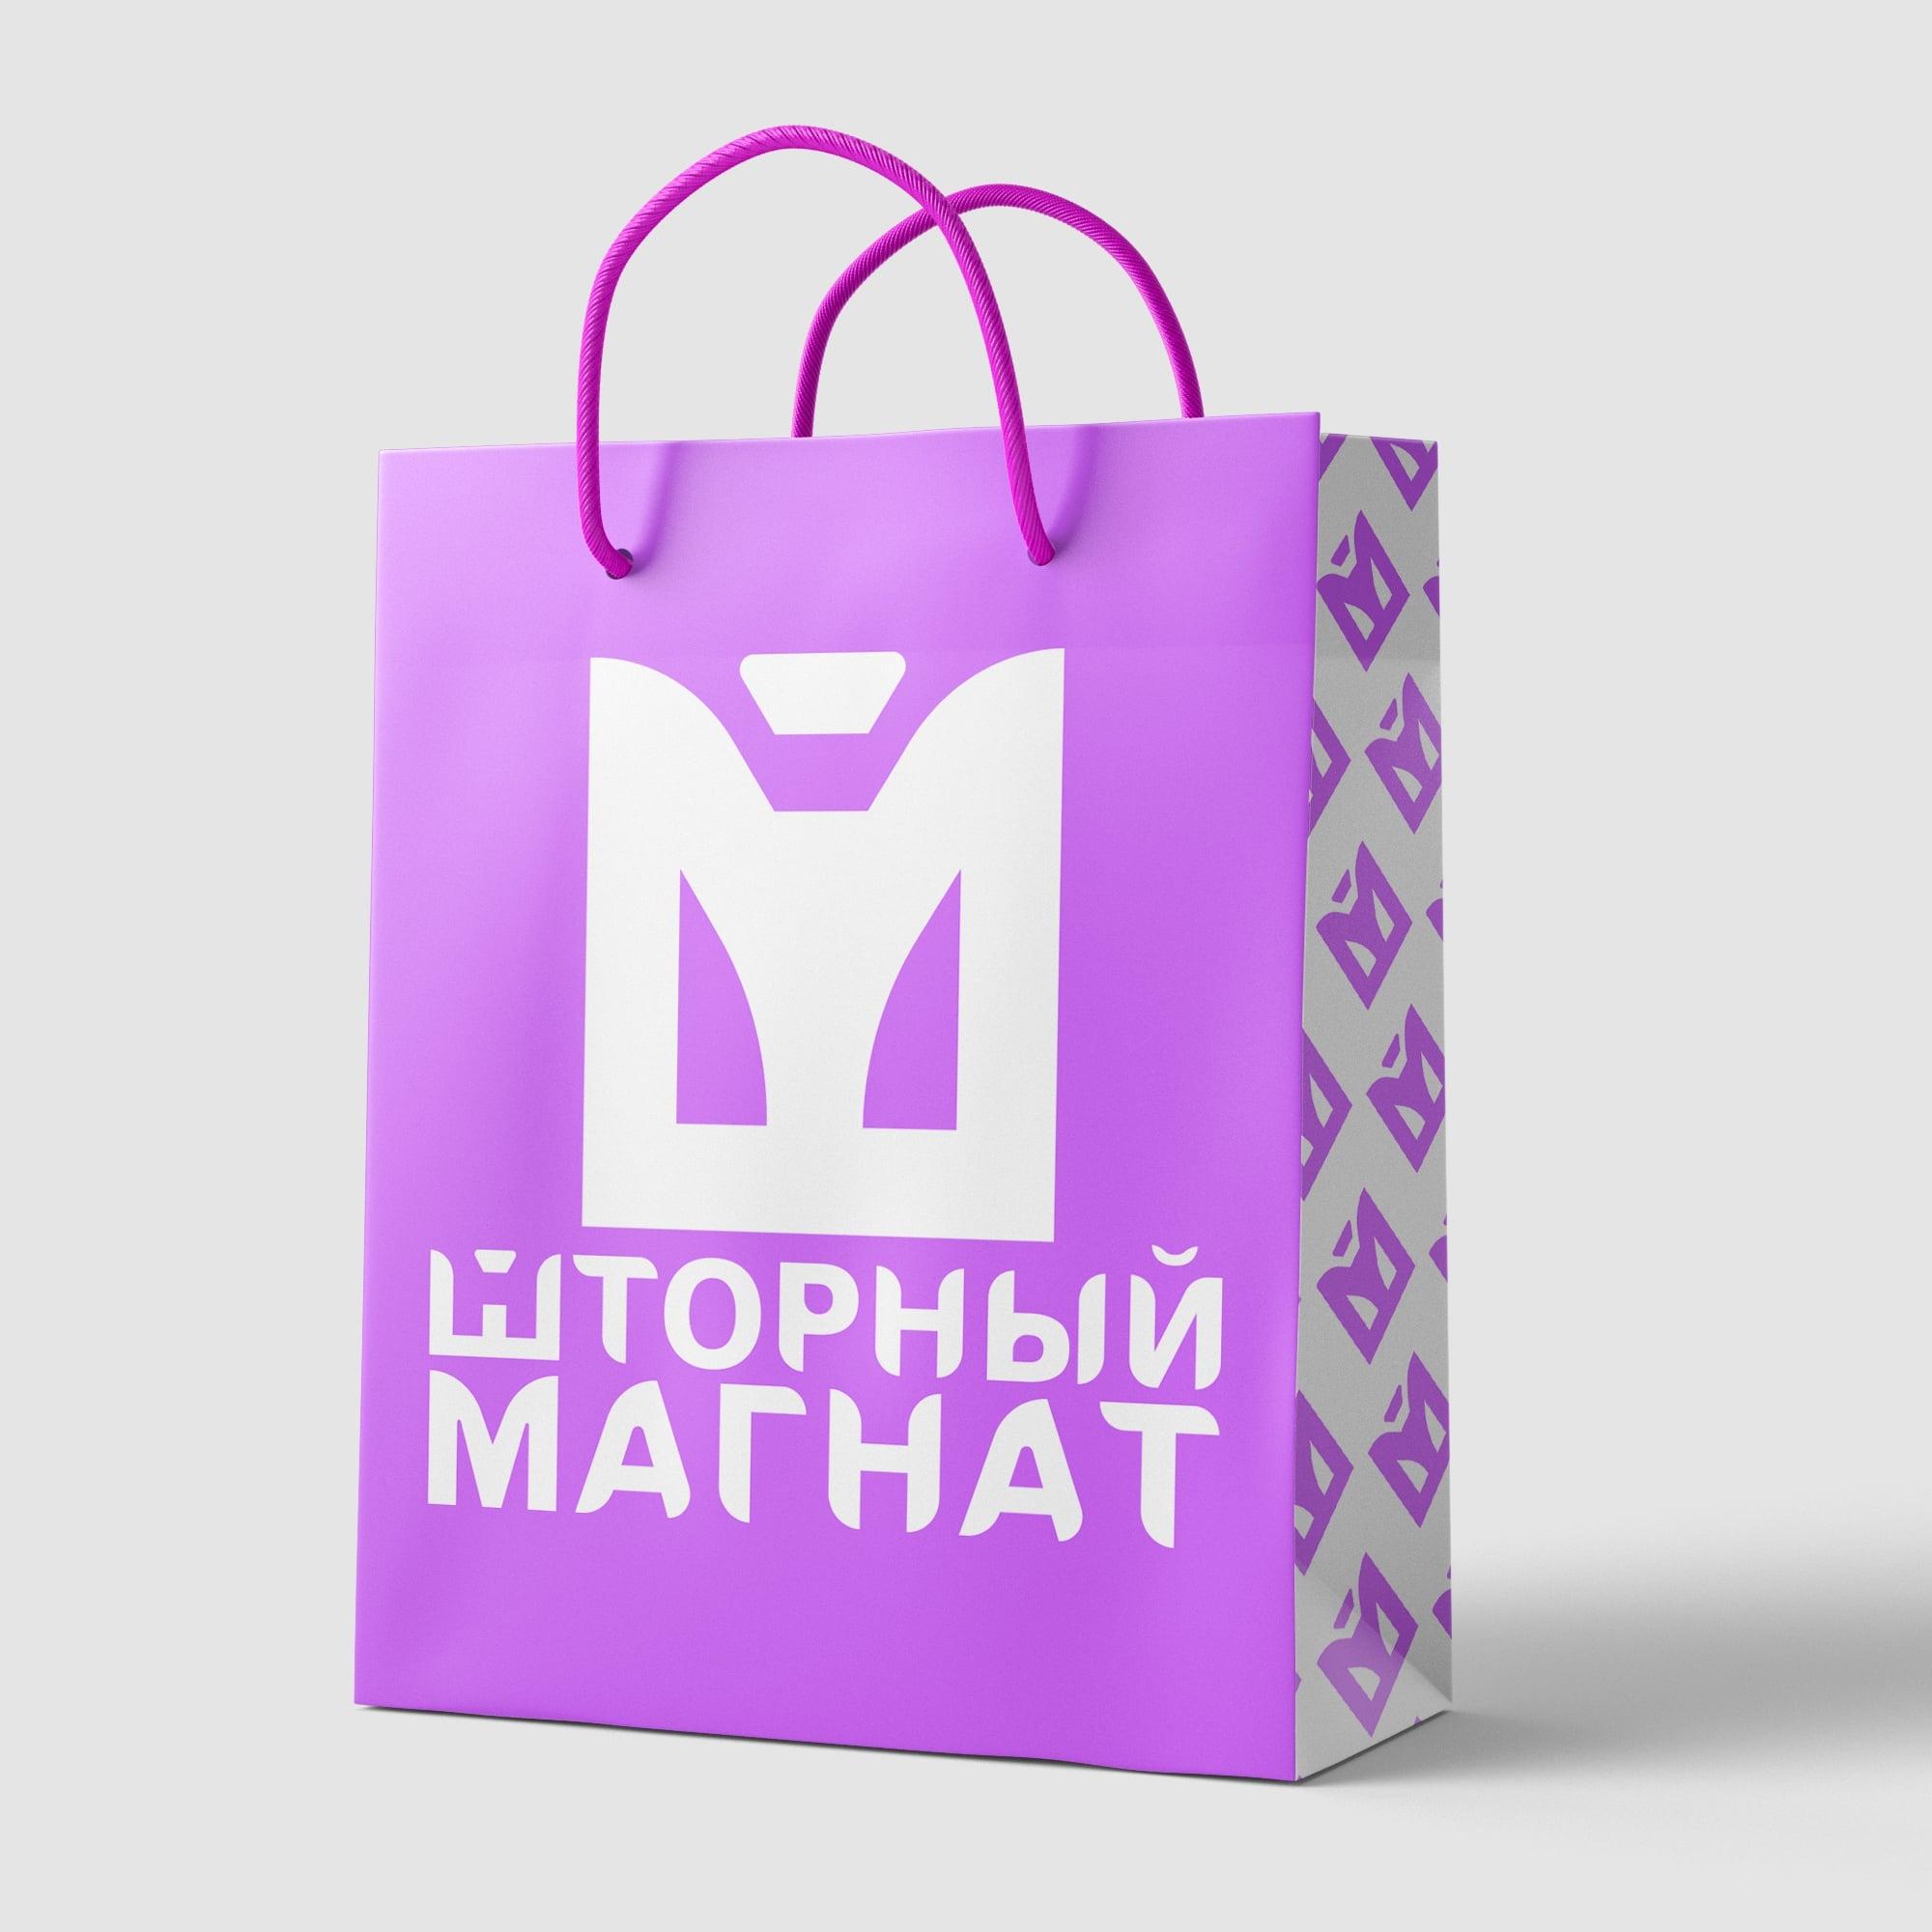 Логотип и фирменный стиль для магазина тканей. фото f_8695ce6cf6aa0e95.jpg